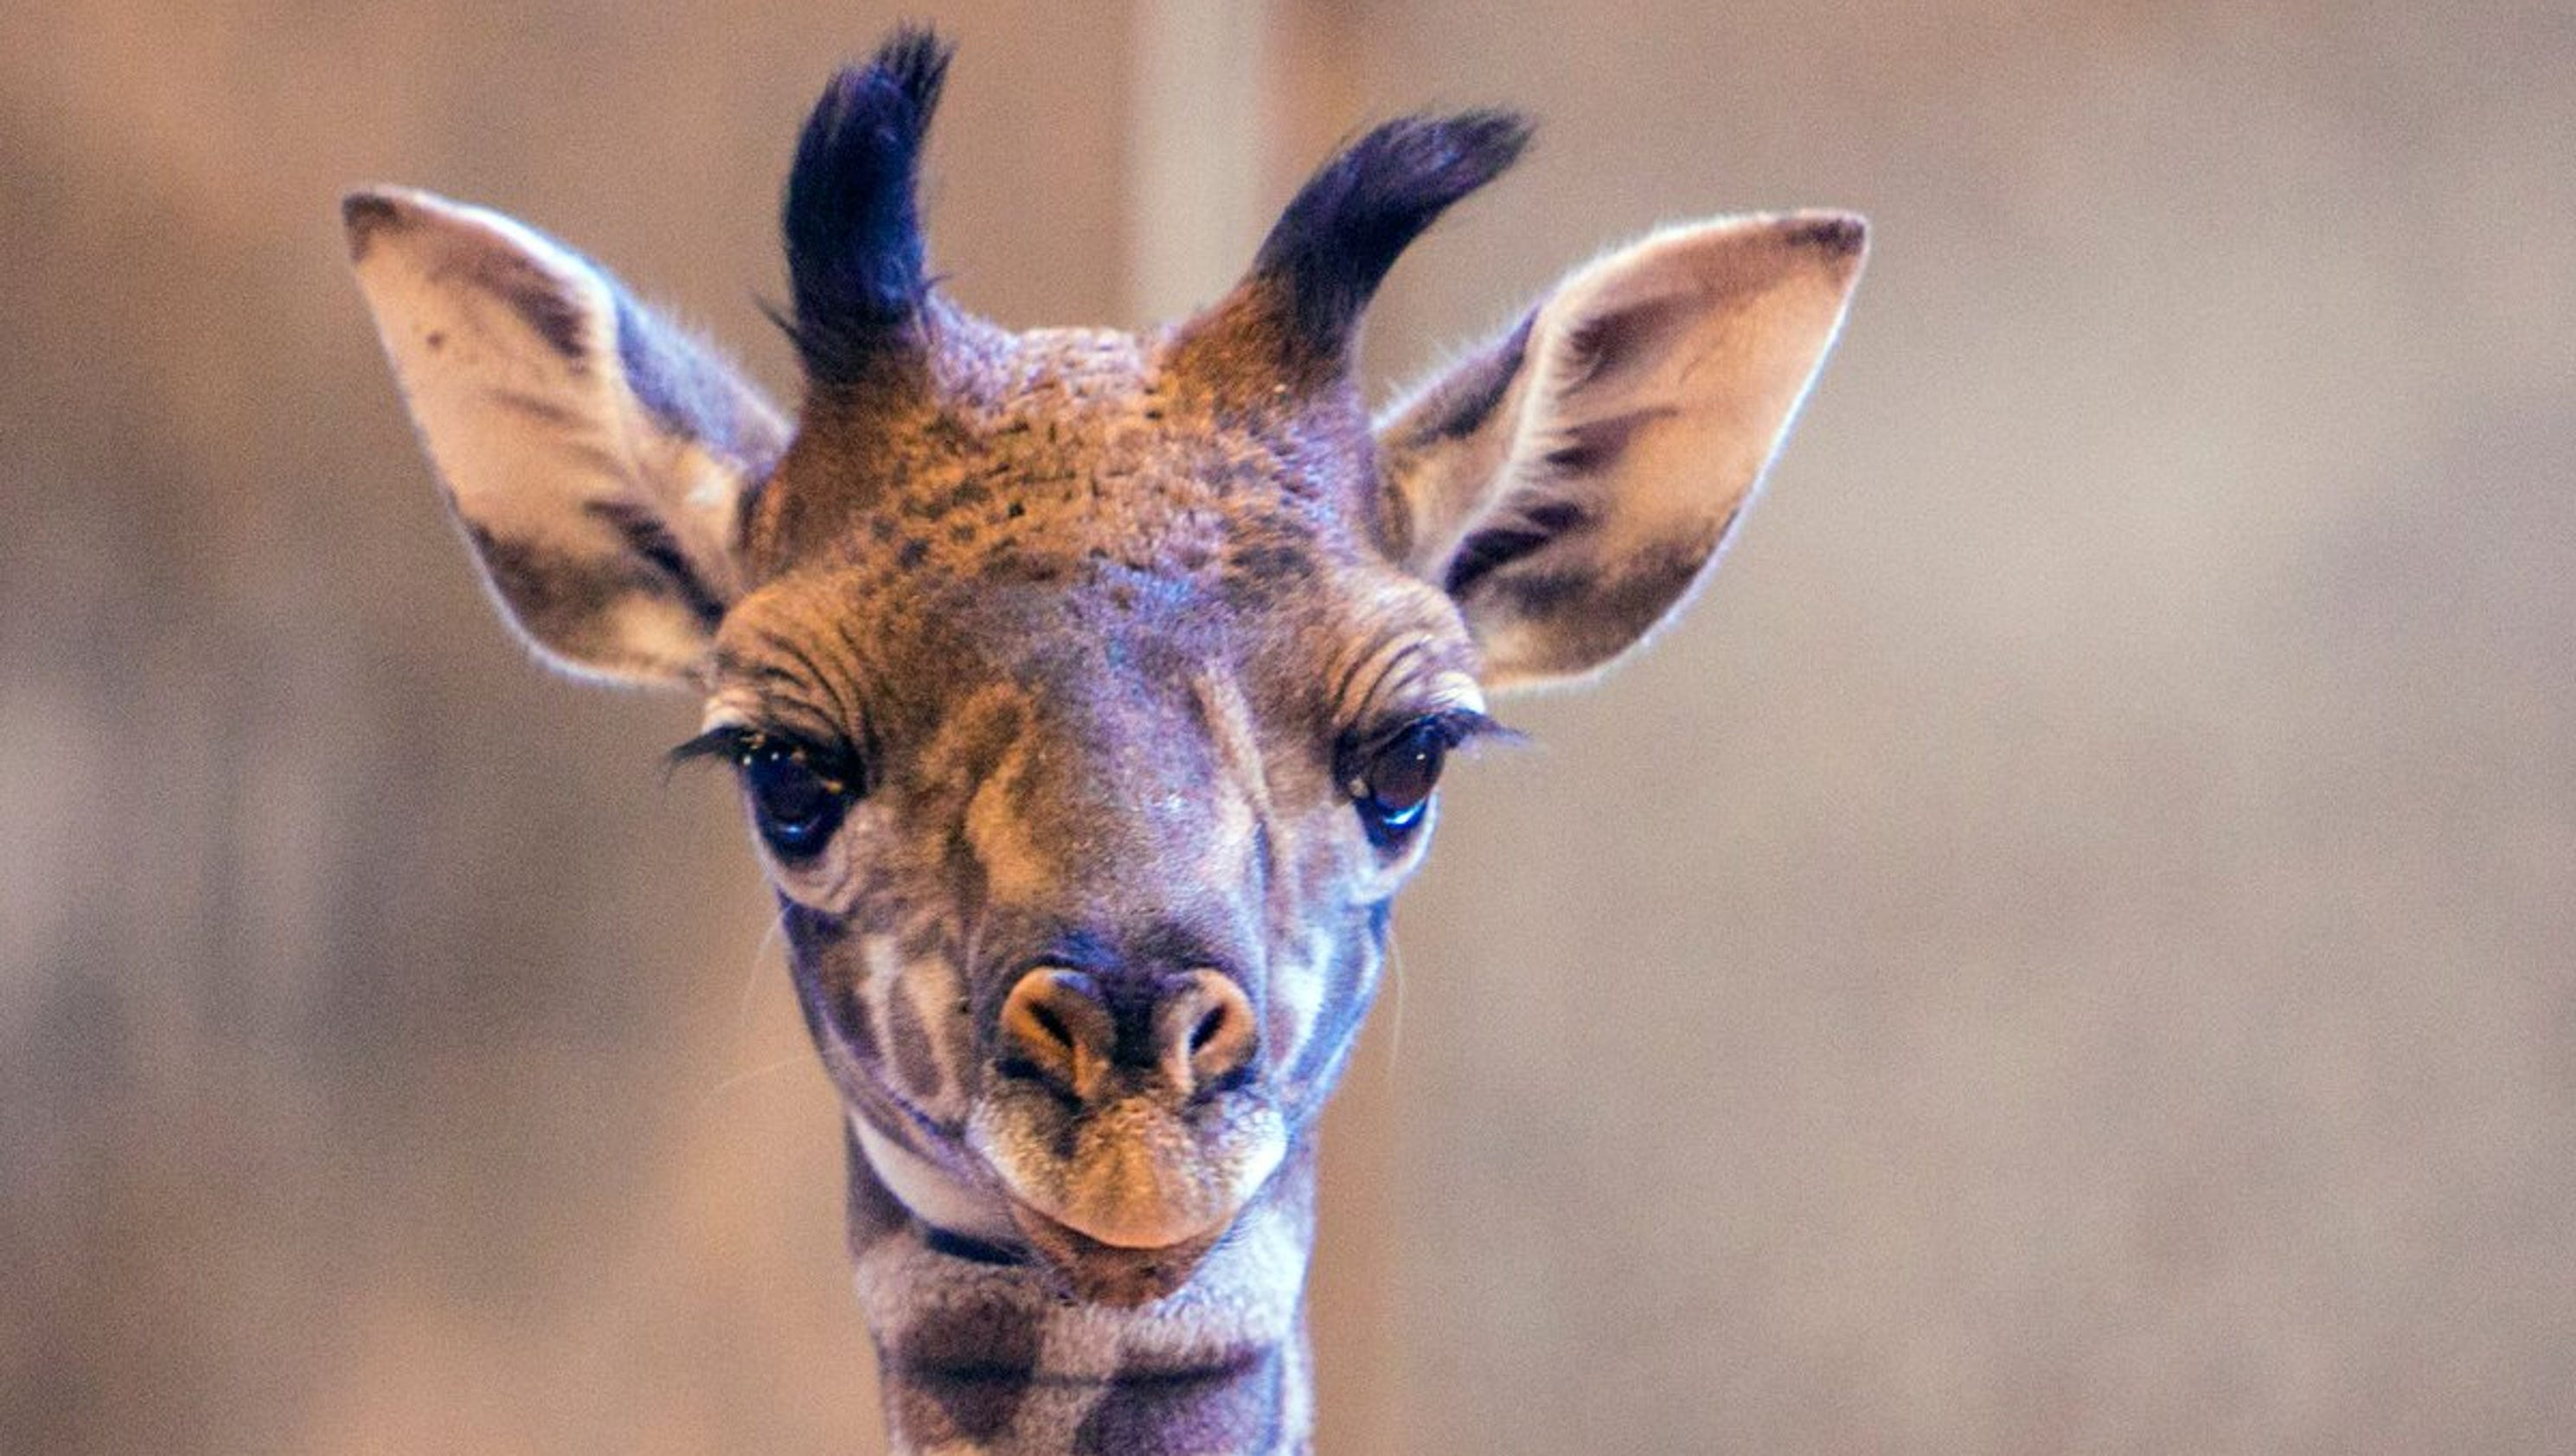 phoenix zoo welcomes first baby giraffe in 12 years